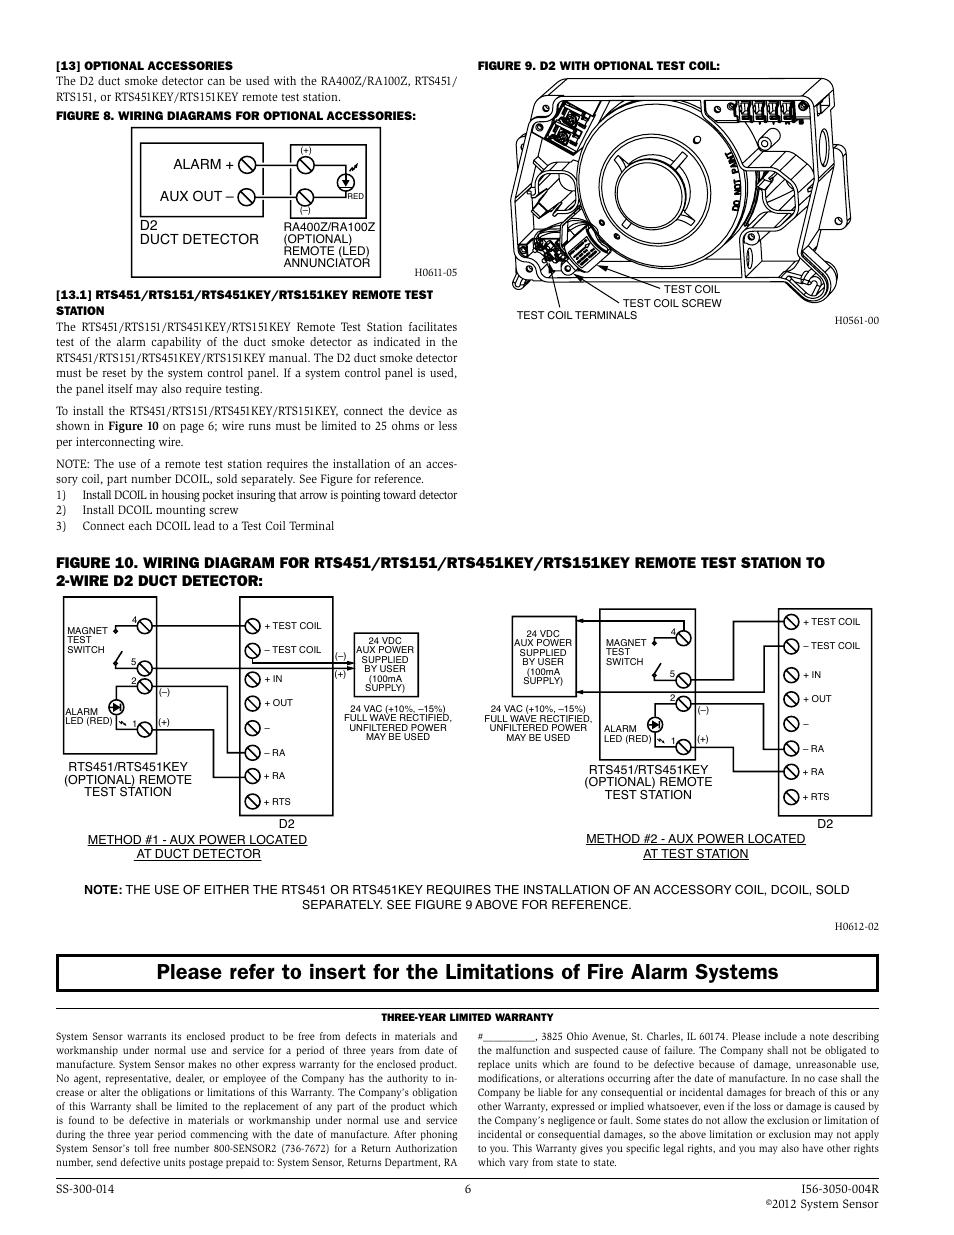 Duct Detector Wiring Diagram from schematron.org